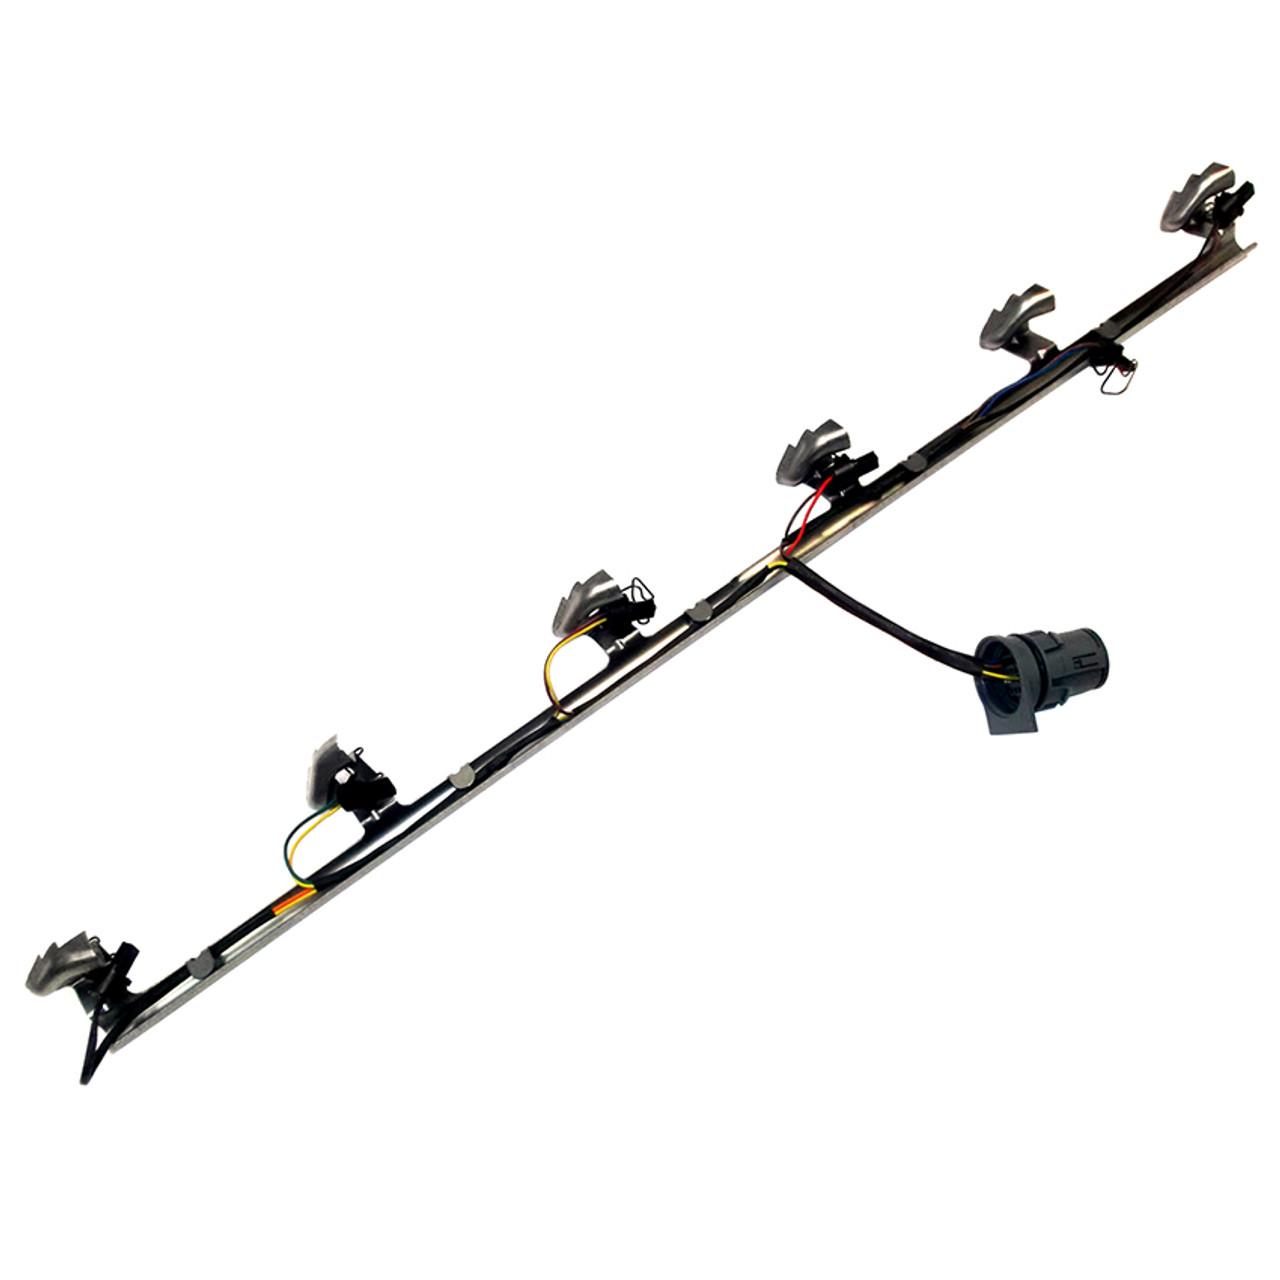 Navistar DT466 Injector Harness 1994-2003 WH06602